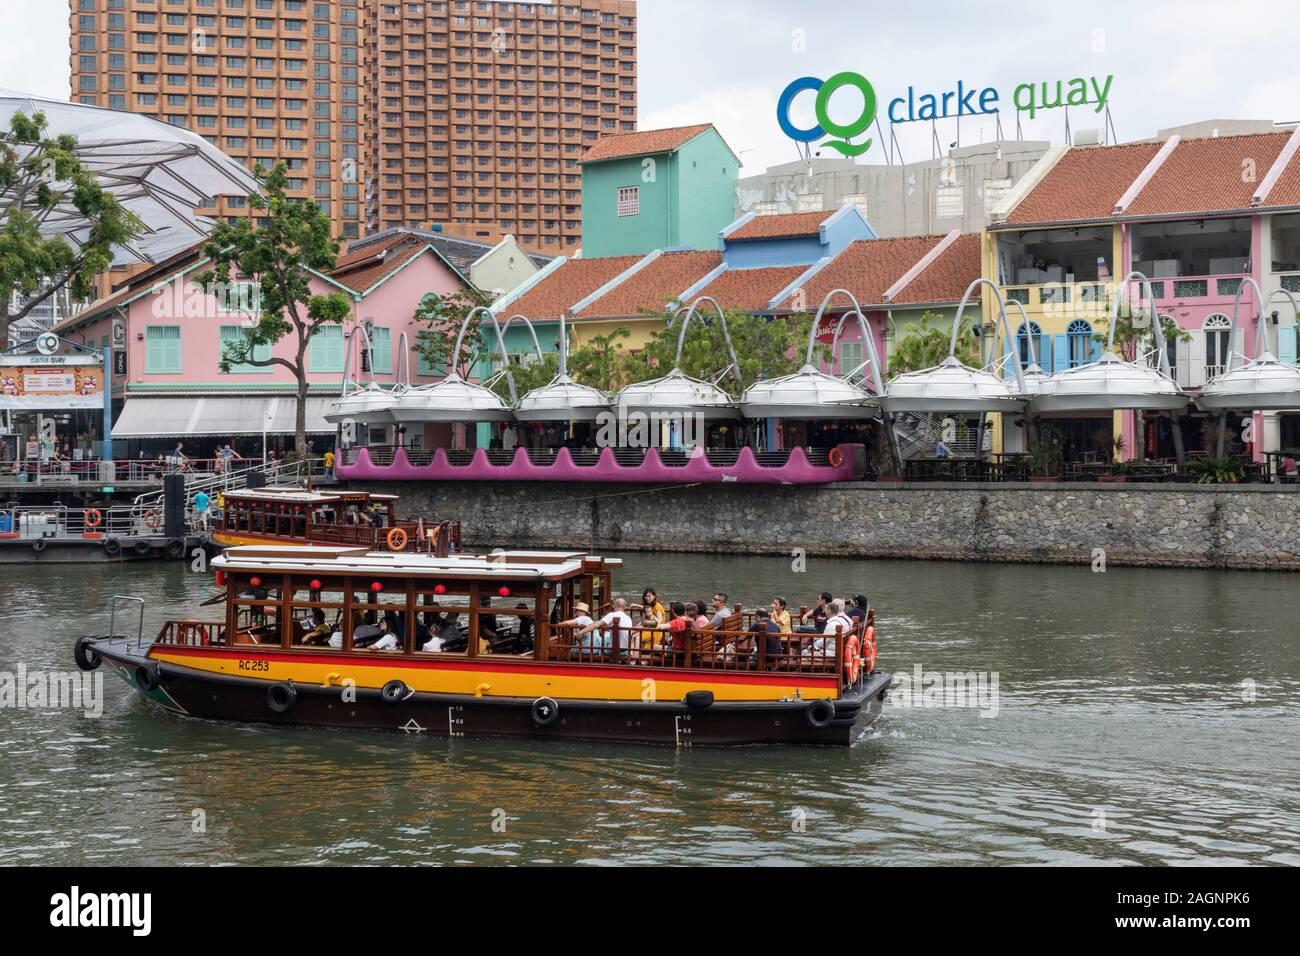 Tourist boat on the River Singapore at, Clarke Quay, Singapore Stock Photo